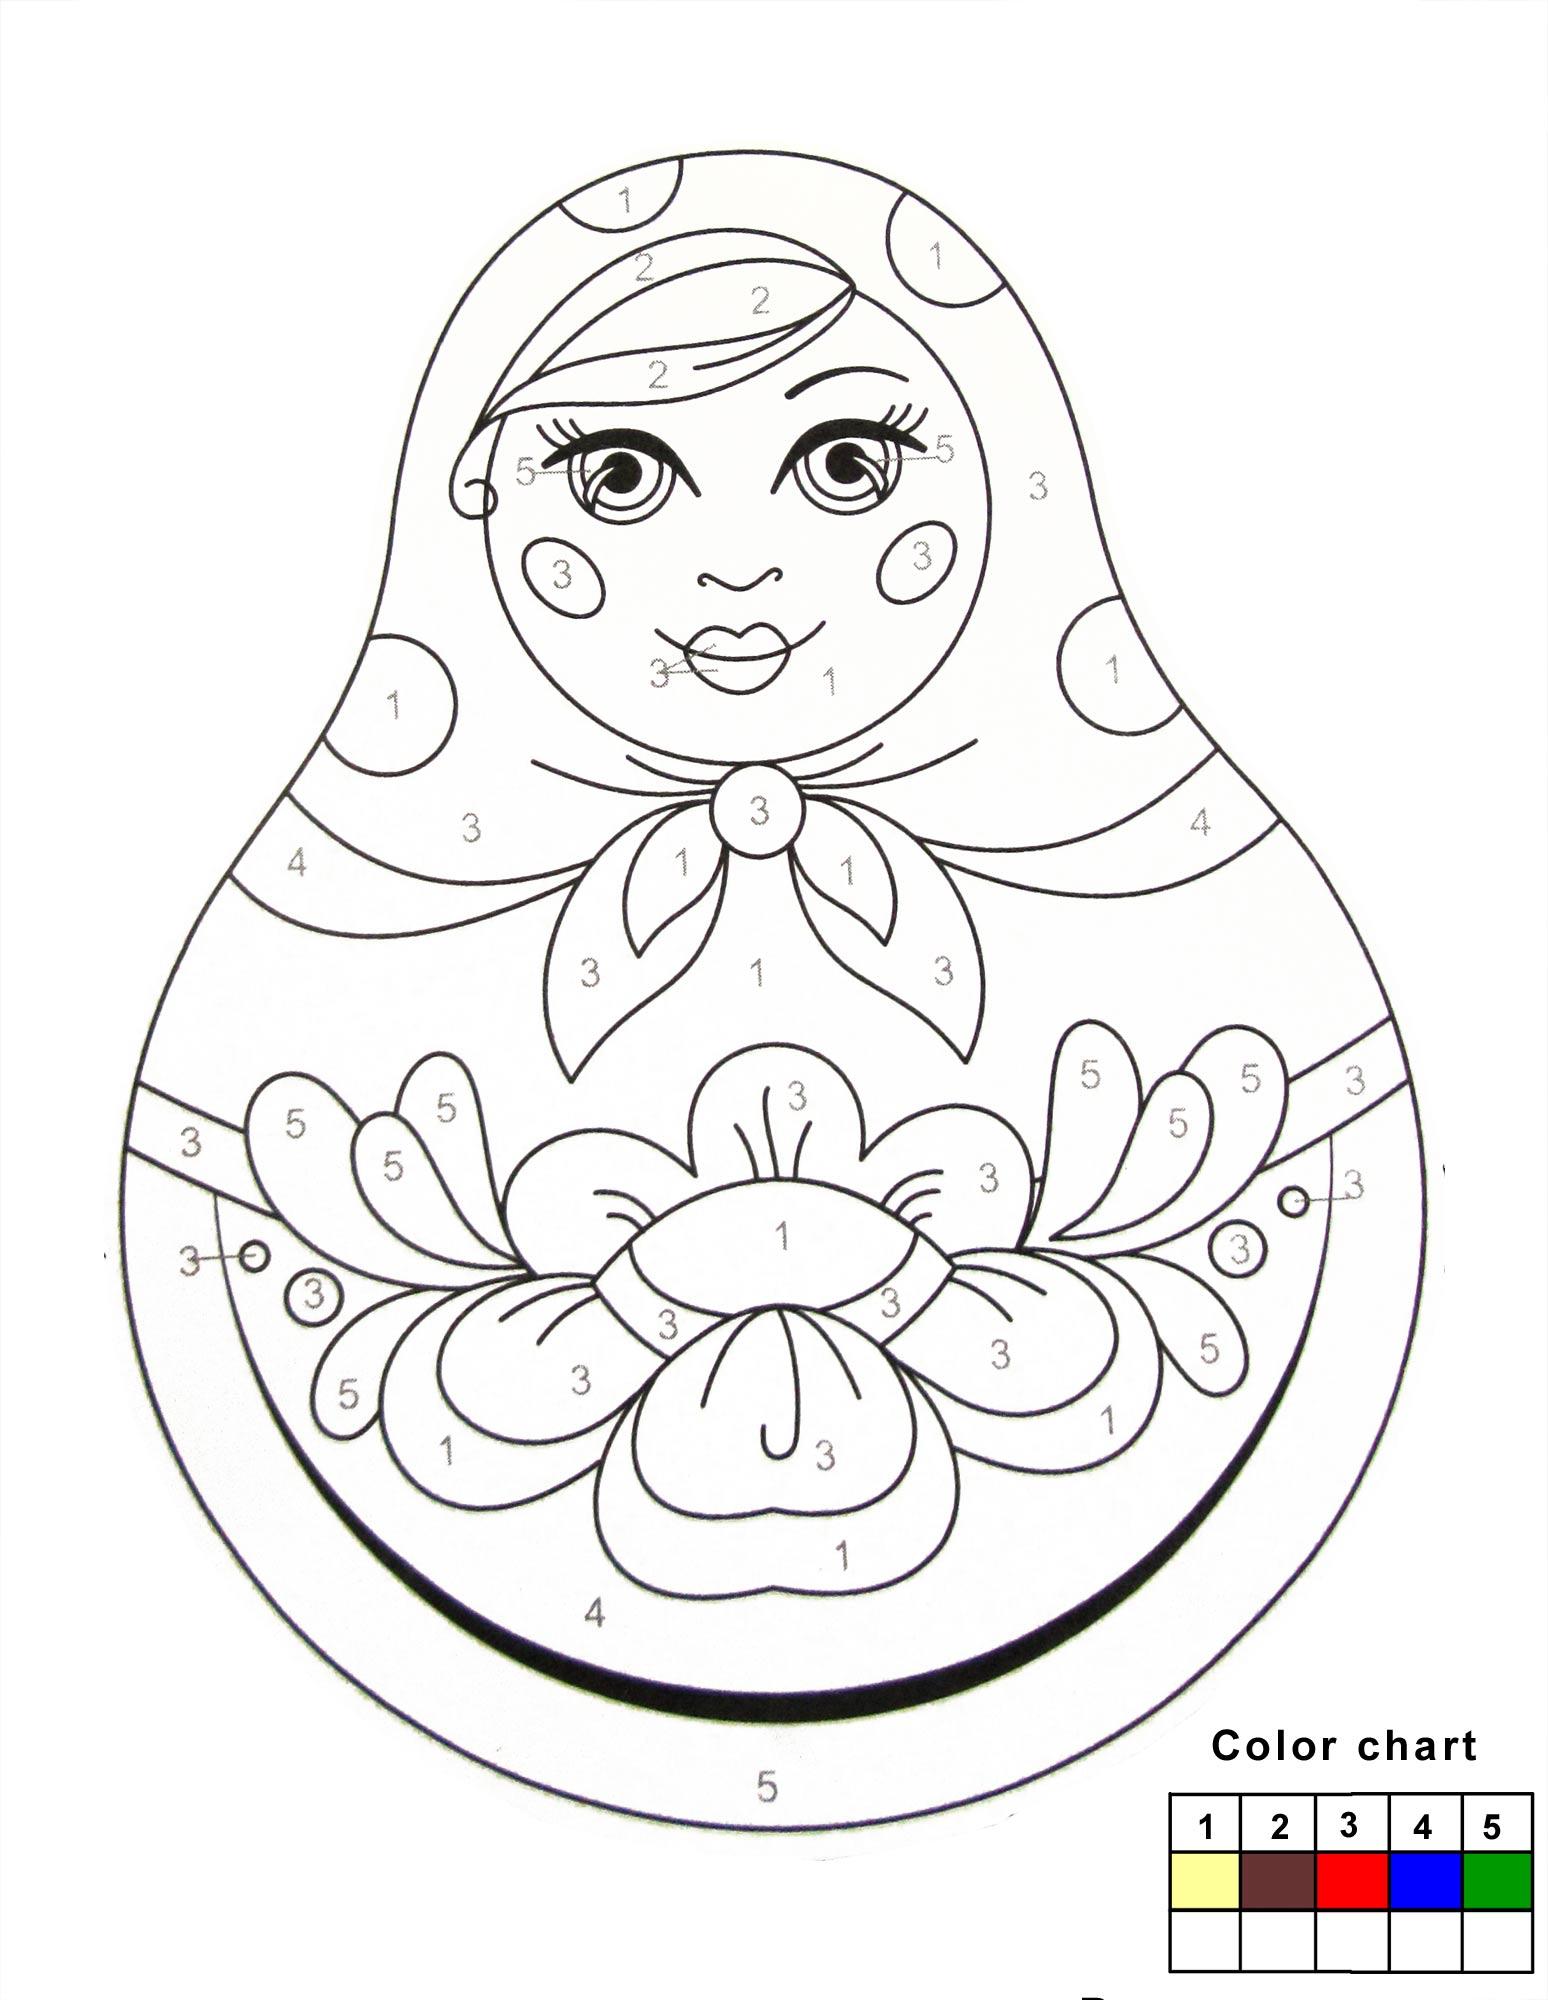 matroyshka dolls coloring pages - photo#25